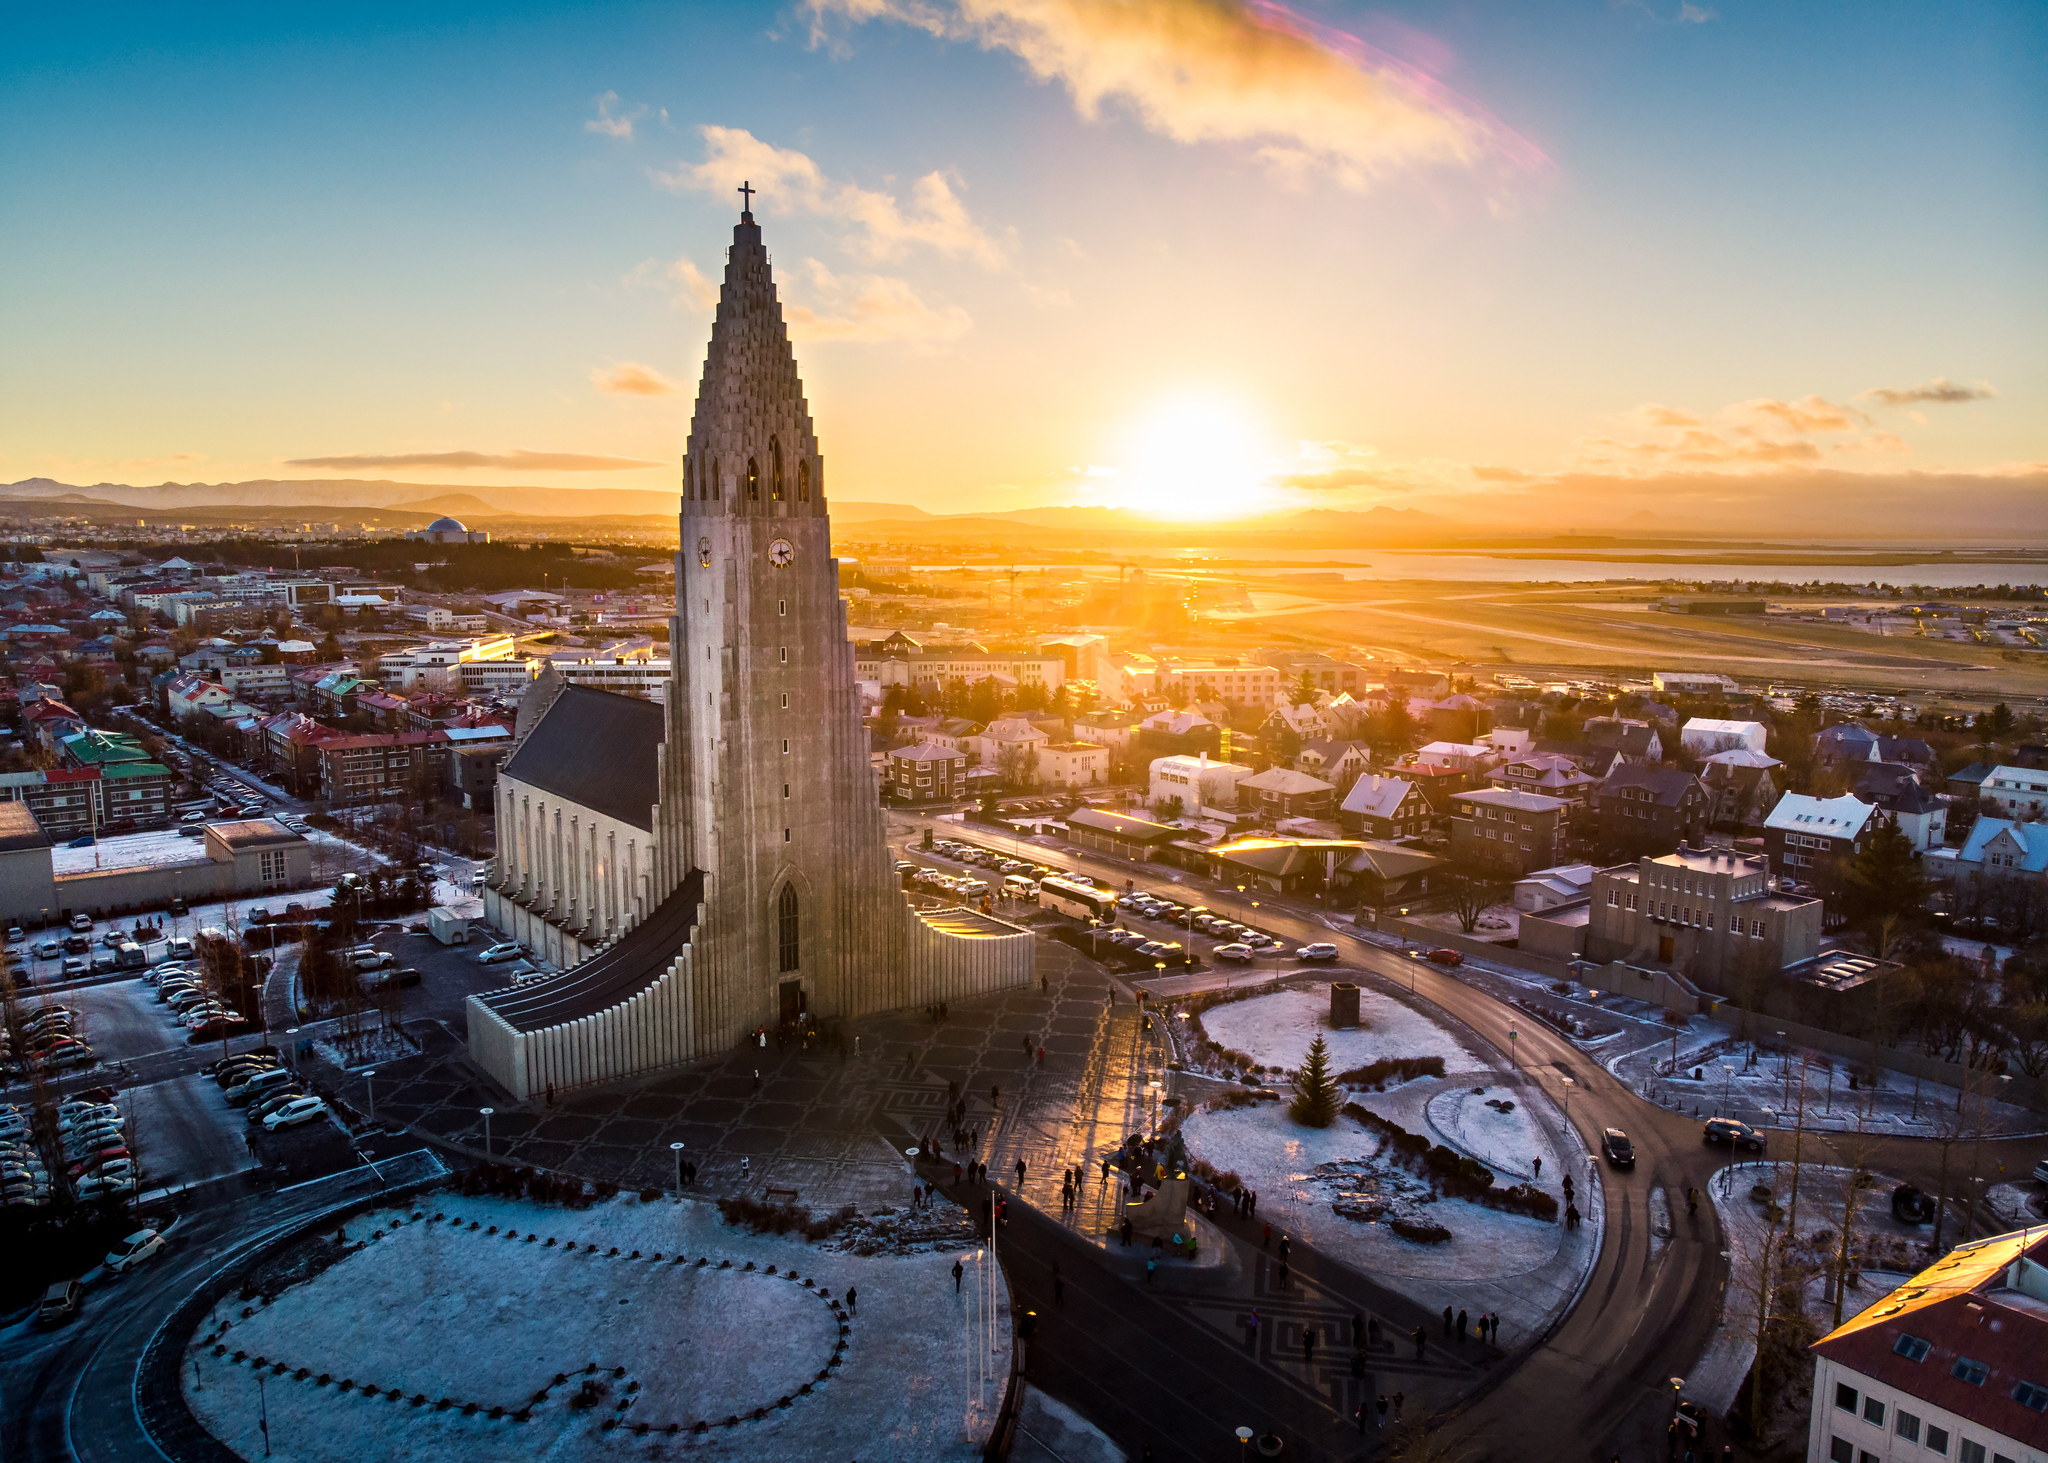 Reykjavik.jfif